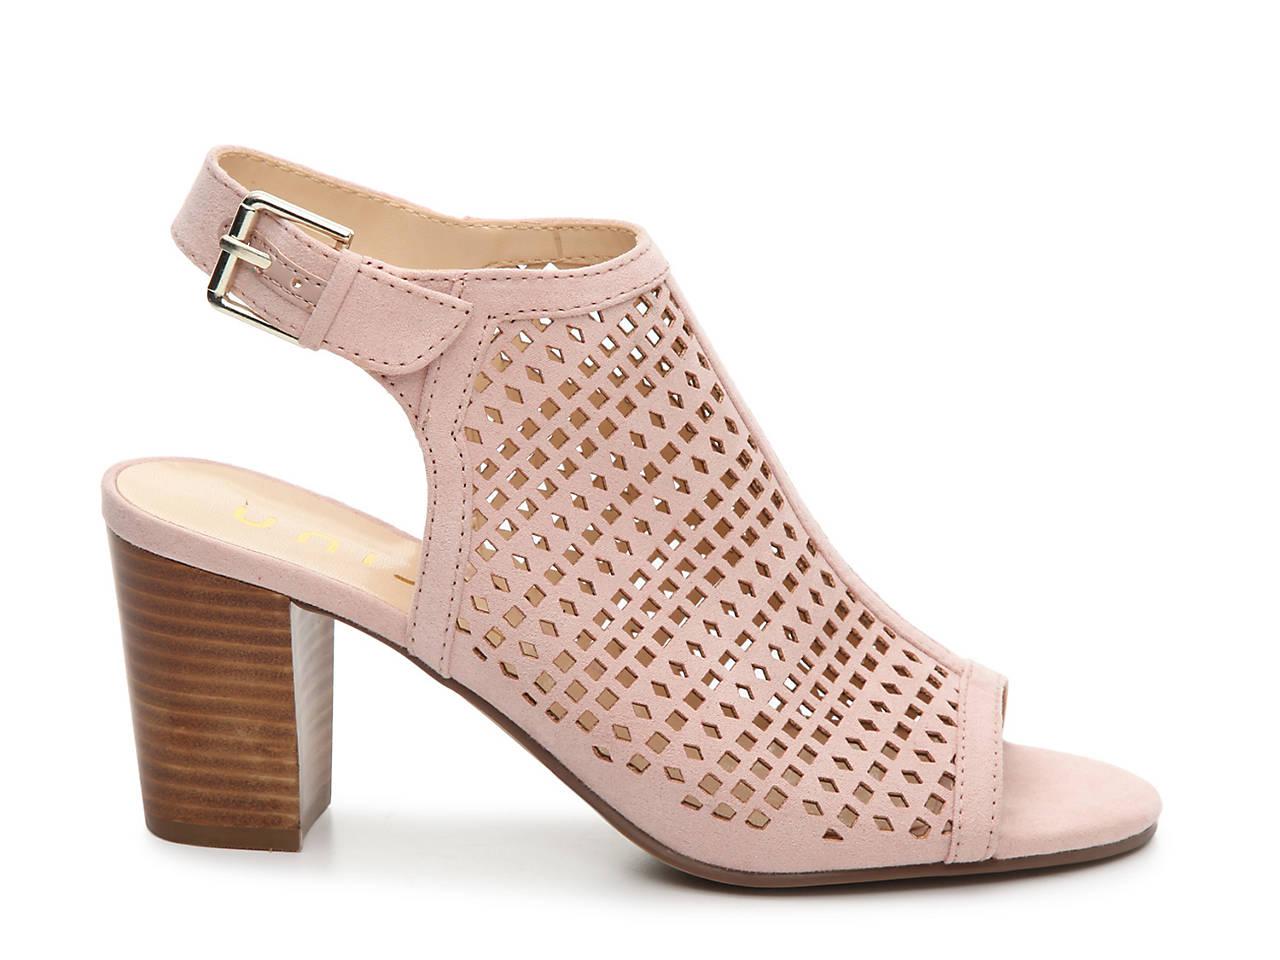 aefef987f Unisa Pryce Sandal Women s Shoes